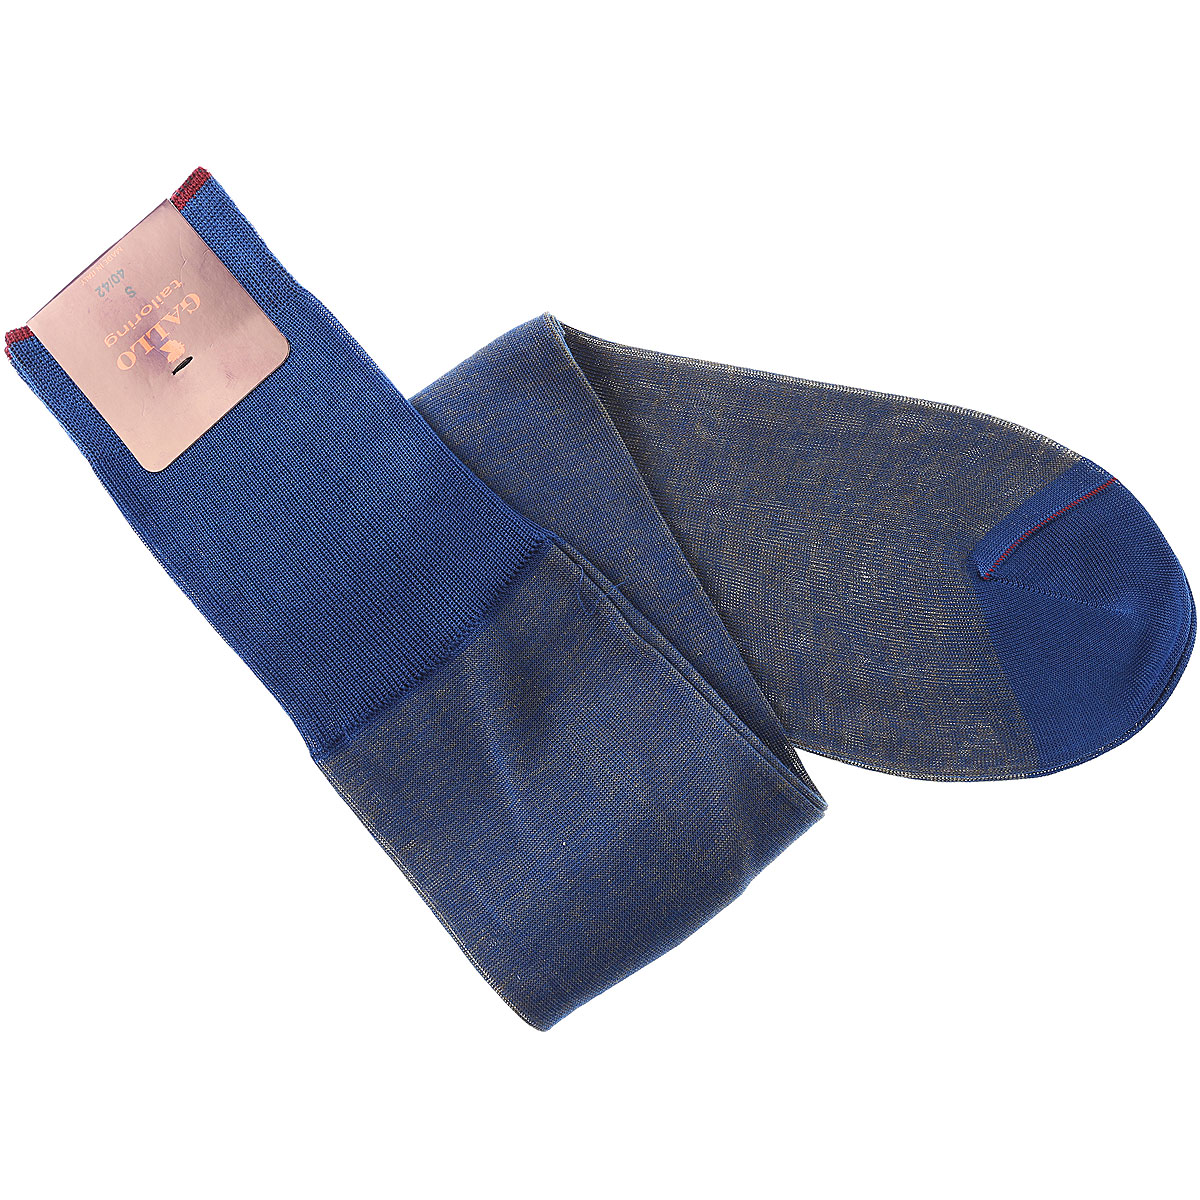 Gallo Socks Socks for Men, Cosmos Blue, Cotton, 2019, S L